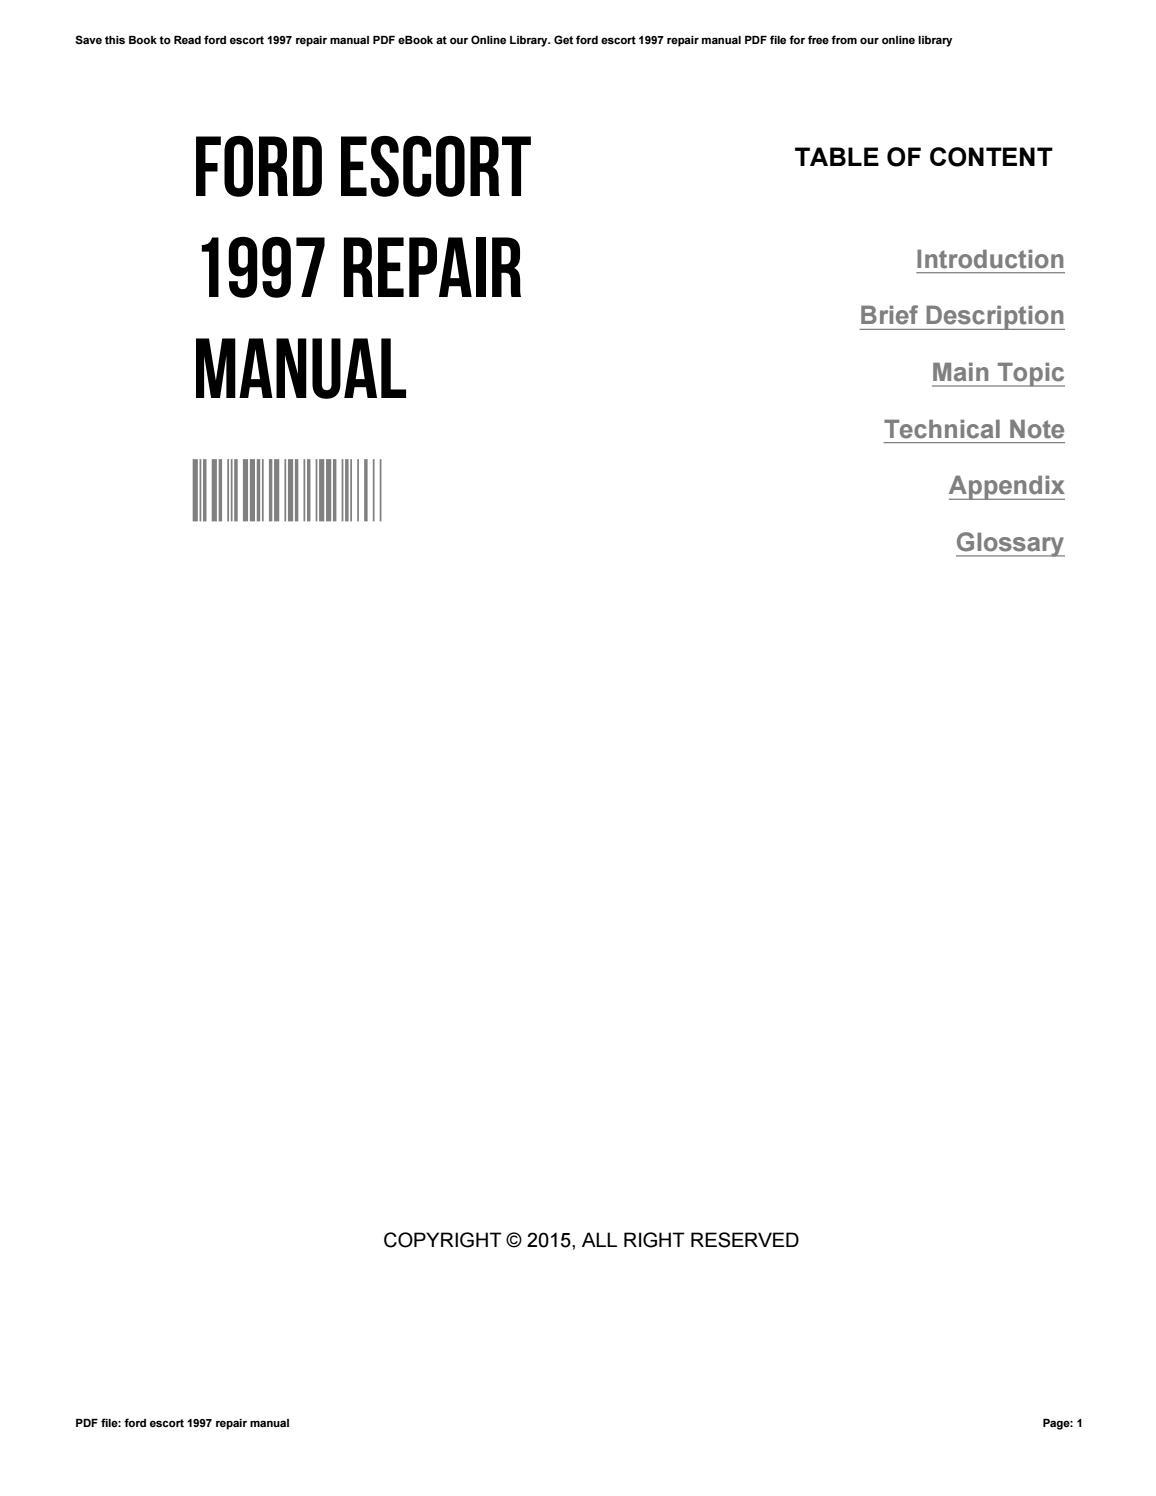 ford escort 1997 repair manual by roberthall4052 issuu